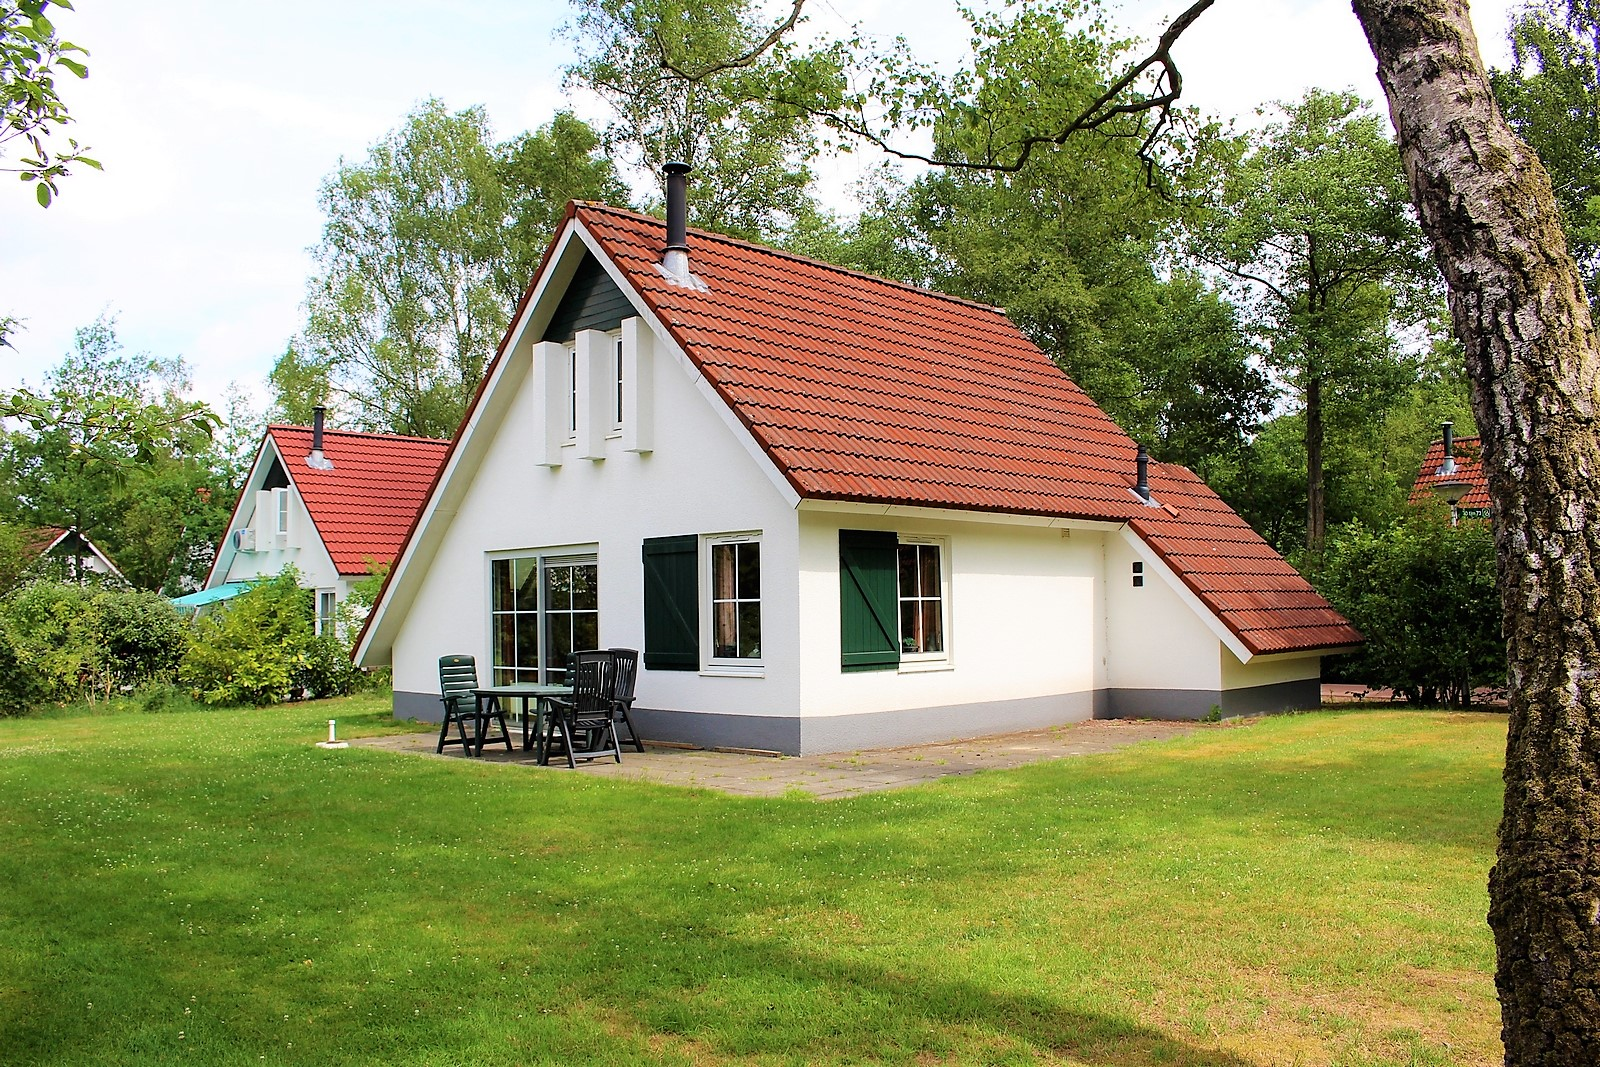 Landal Landgoed De Elsgraven 69, type de luxe